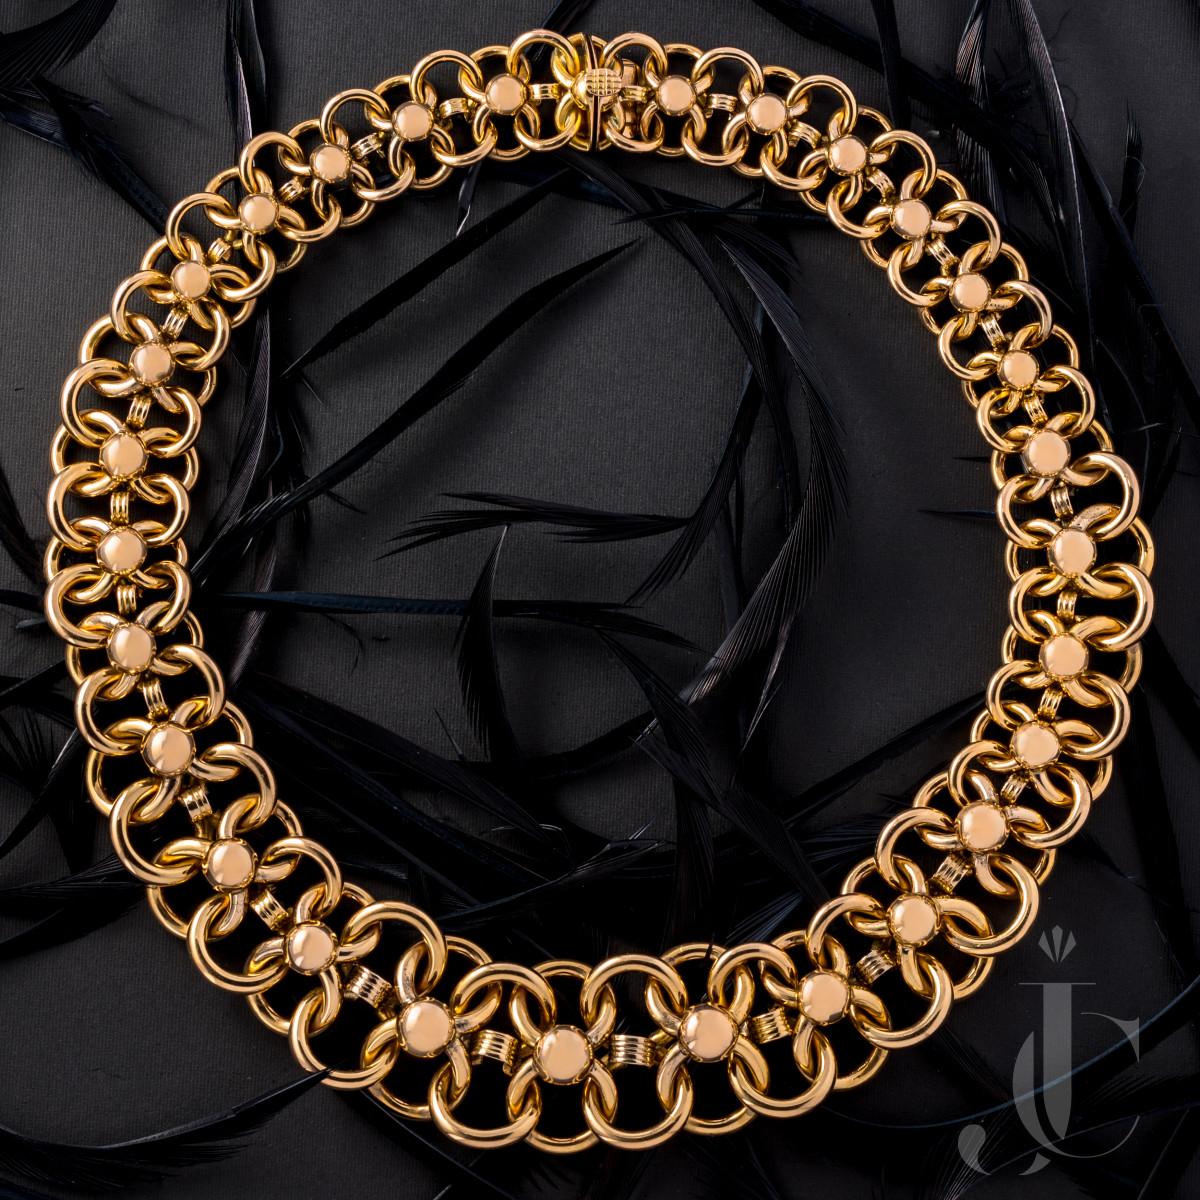 Retro 18 Karat Yellow Gold Necklace